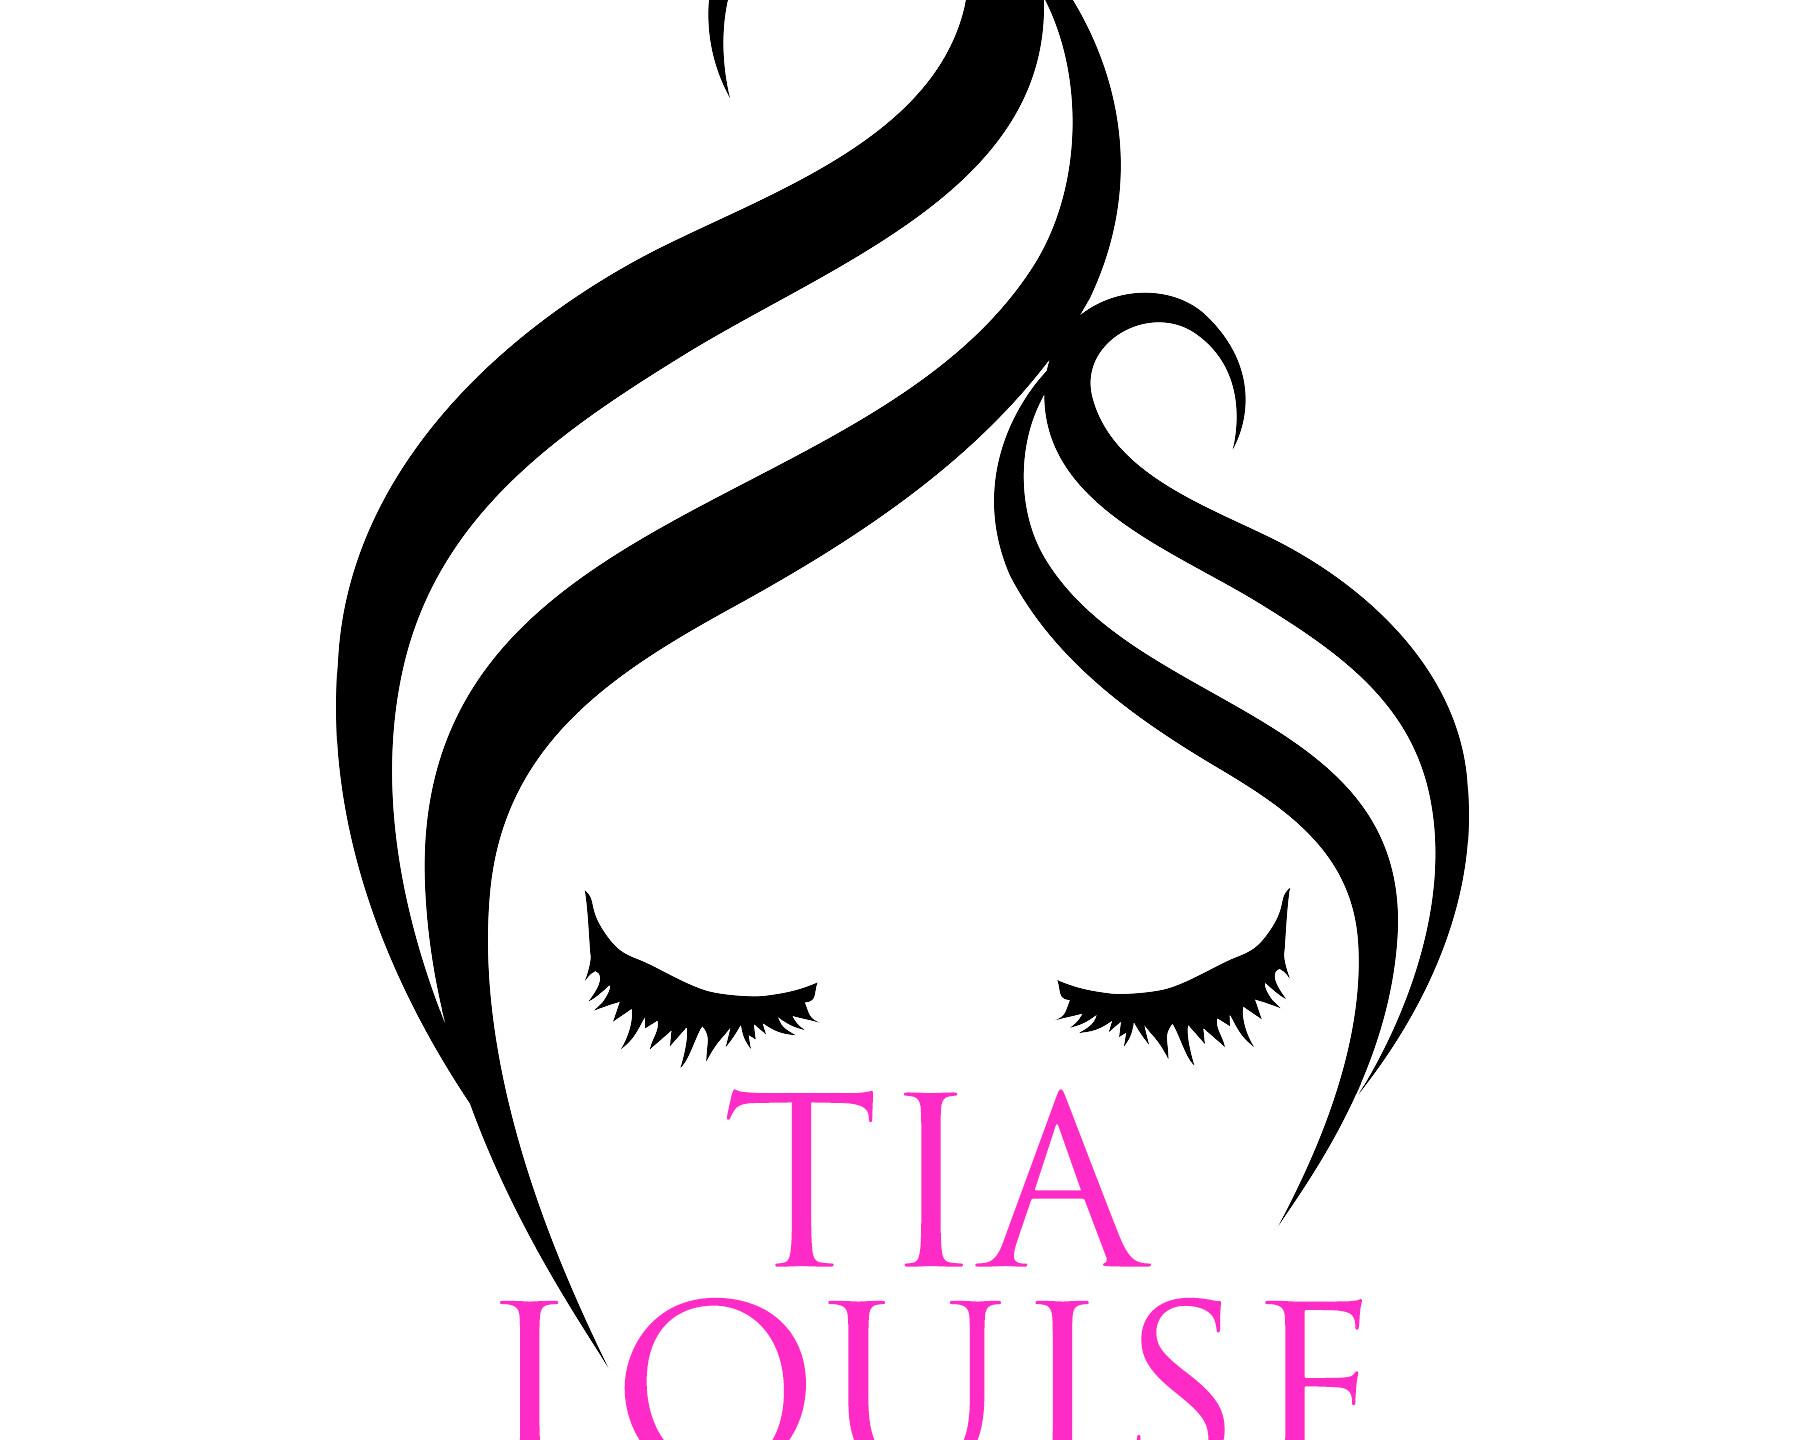 TLM new logo